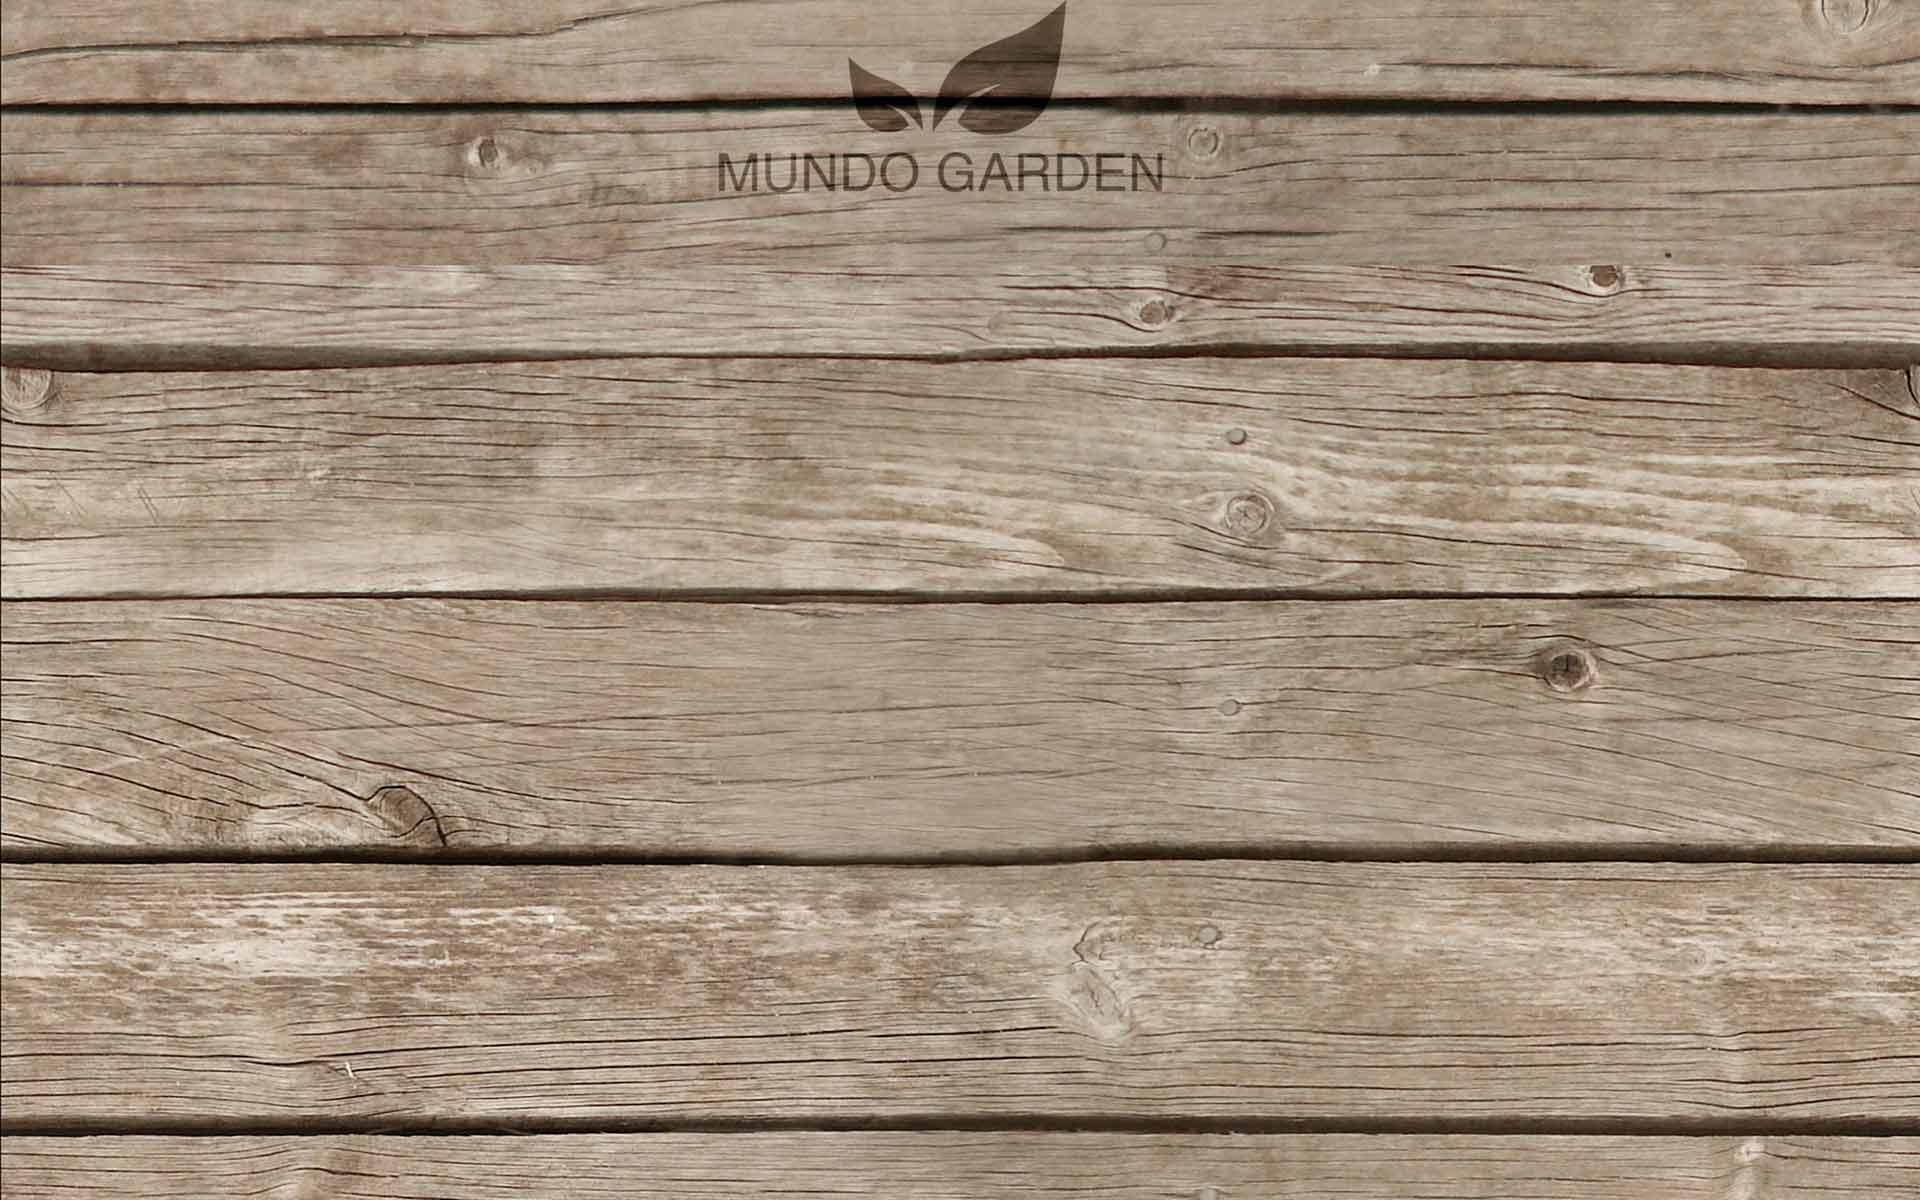 Mundo Garden Huerta Vertical Organica # Muebles La Huerta